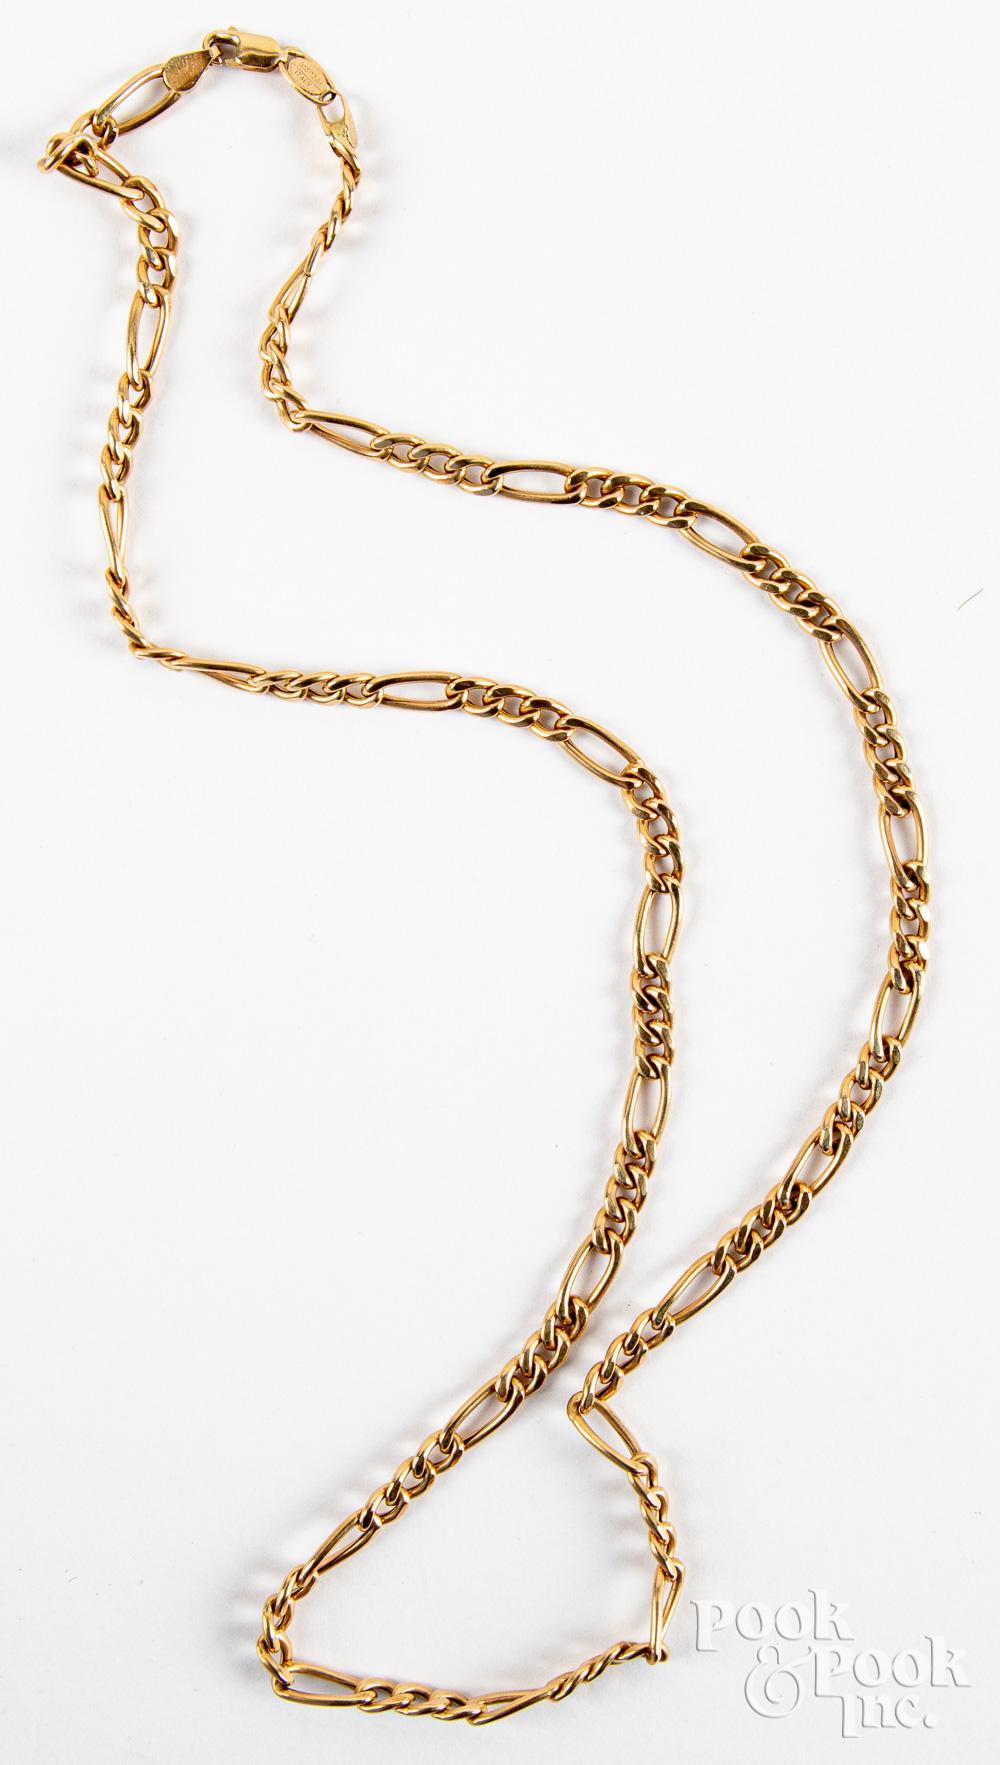 14K gold necklace, 5.9dwt.